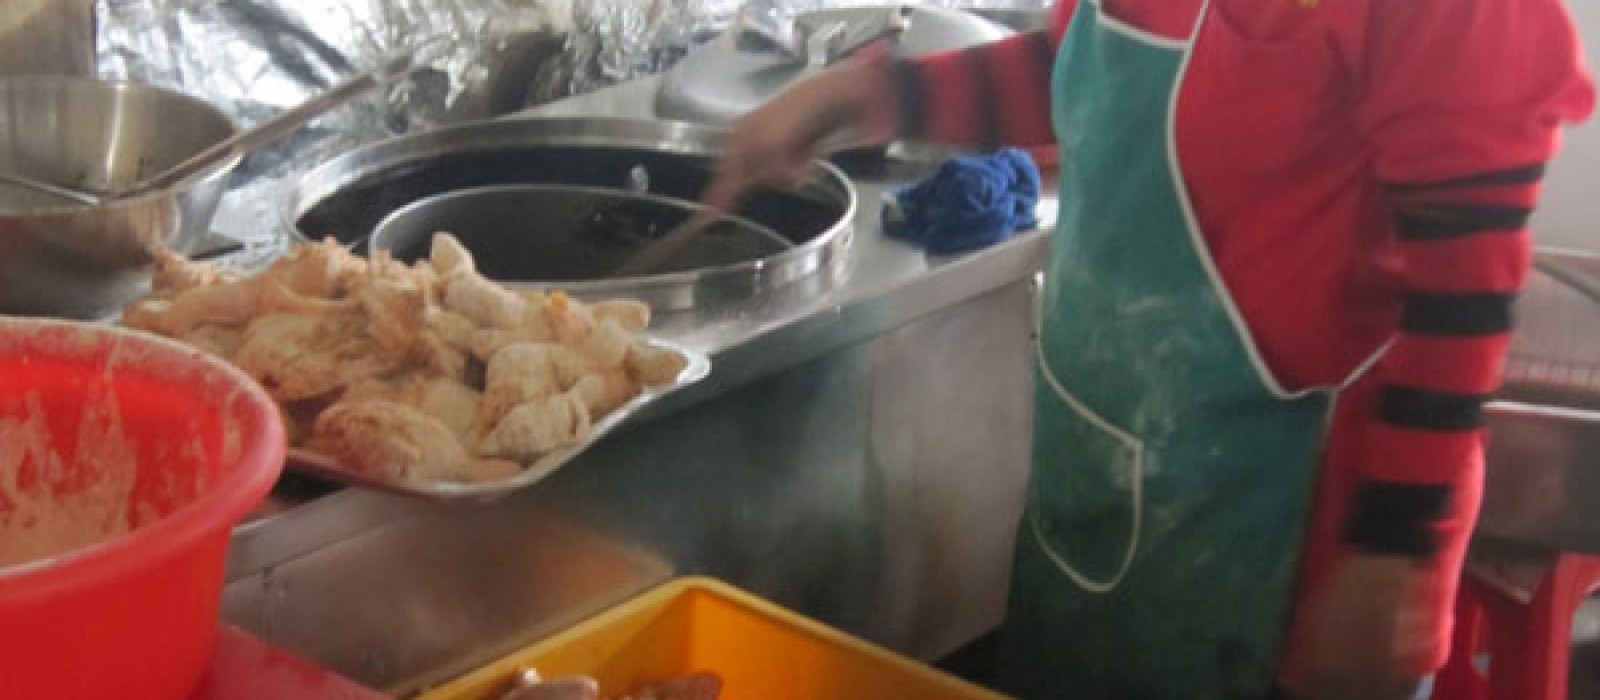 Frying process